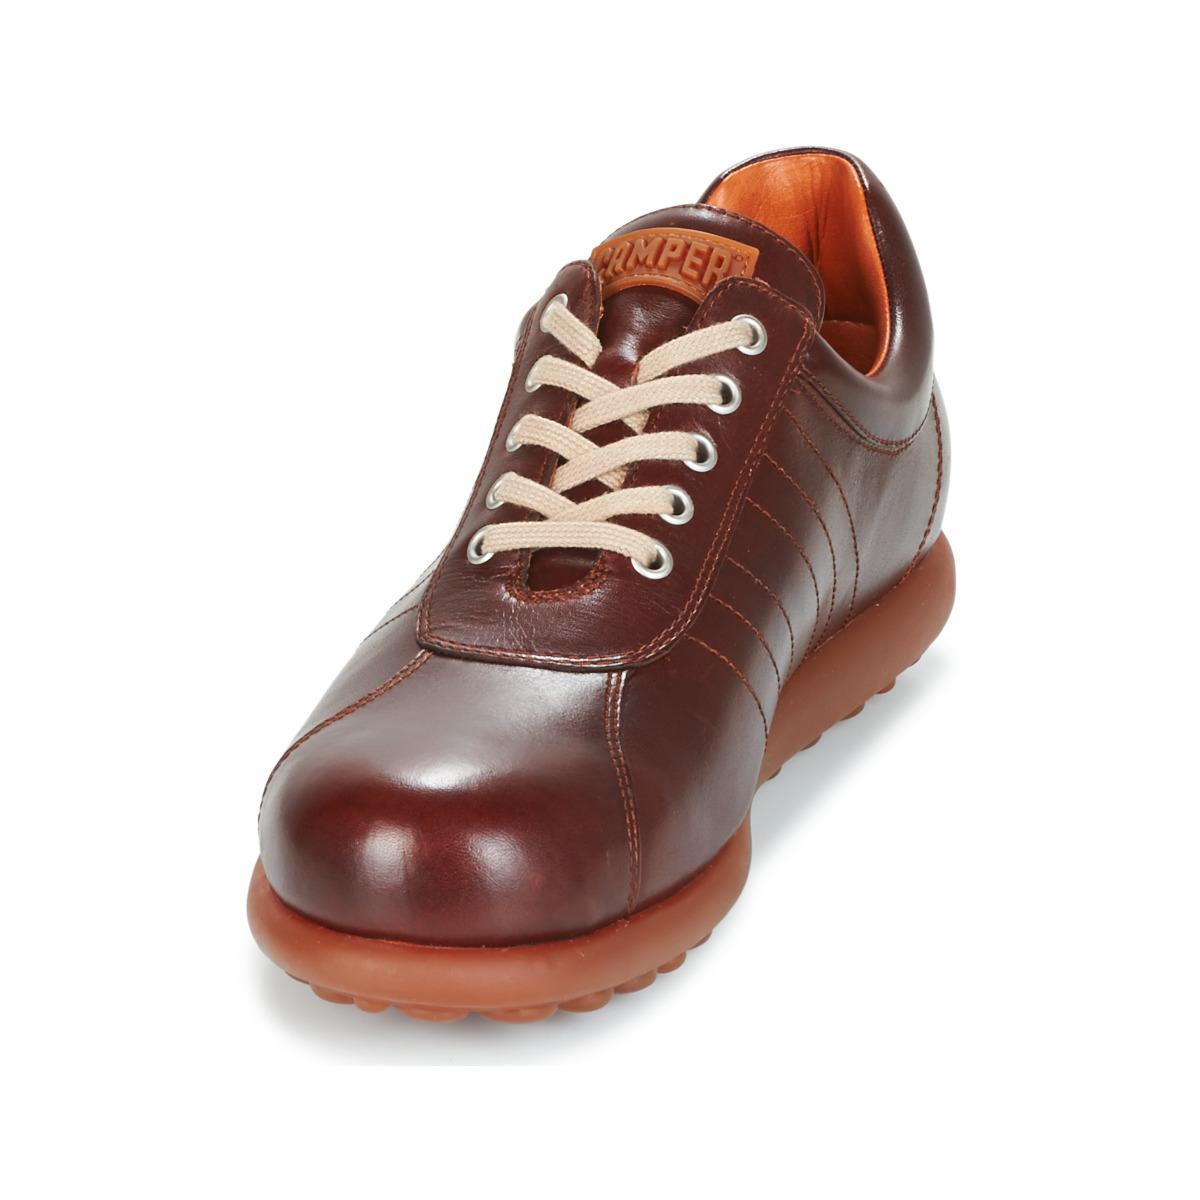 Camper - Brown Pelotas Ariel Casual Shoes for Men - Lyst. View fullscreen ae1e332c3ff